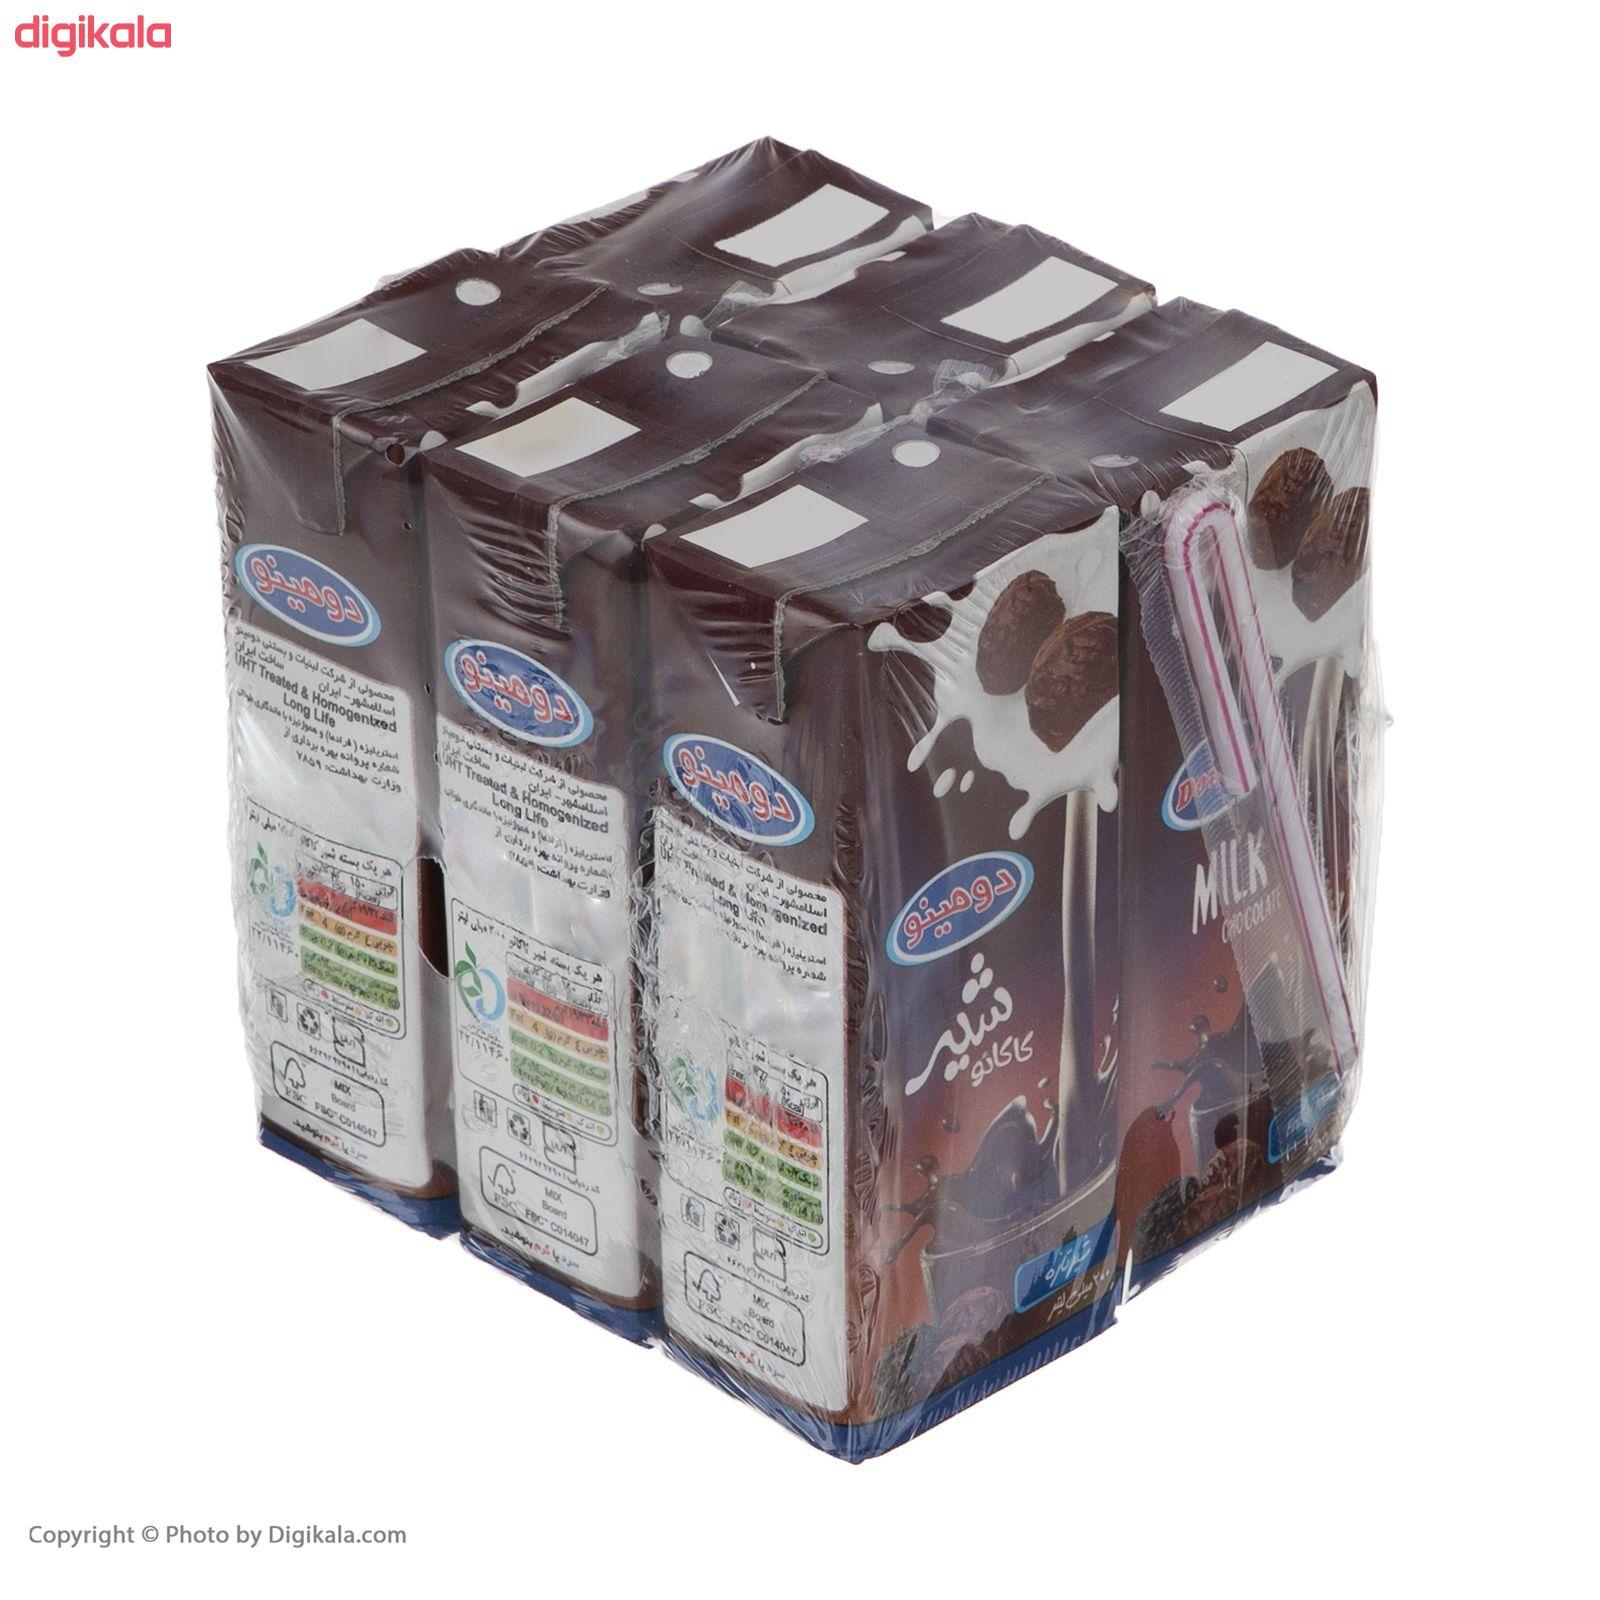 شیر کاکائو دومینو - 0.2 لیتر بسته 6 عددی main 1 5